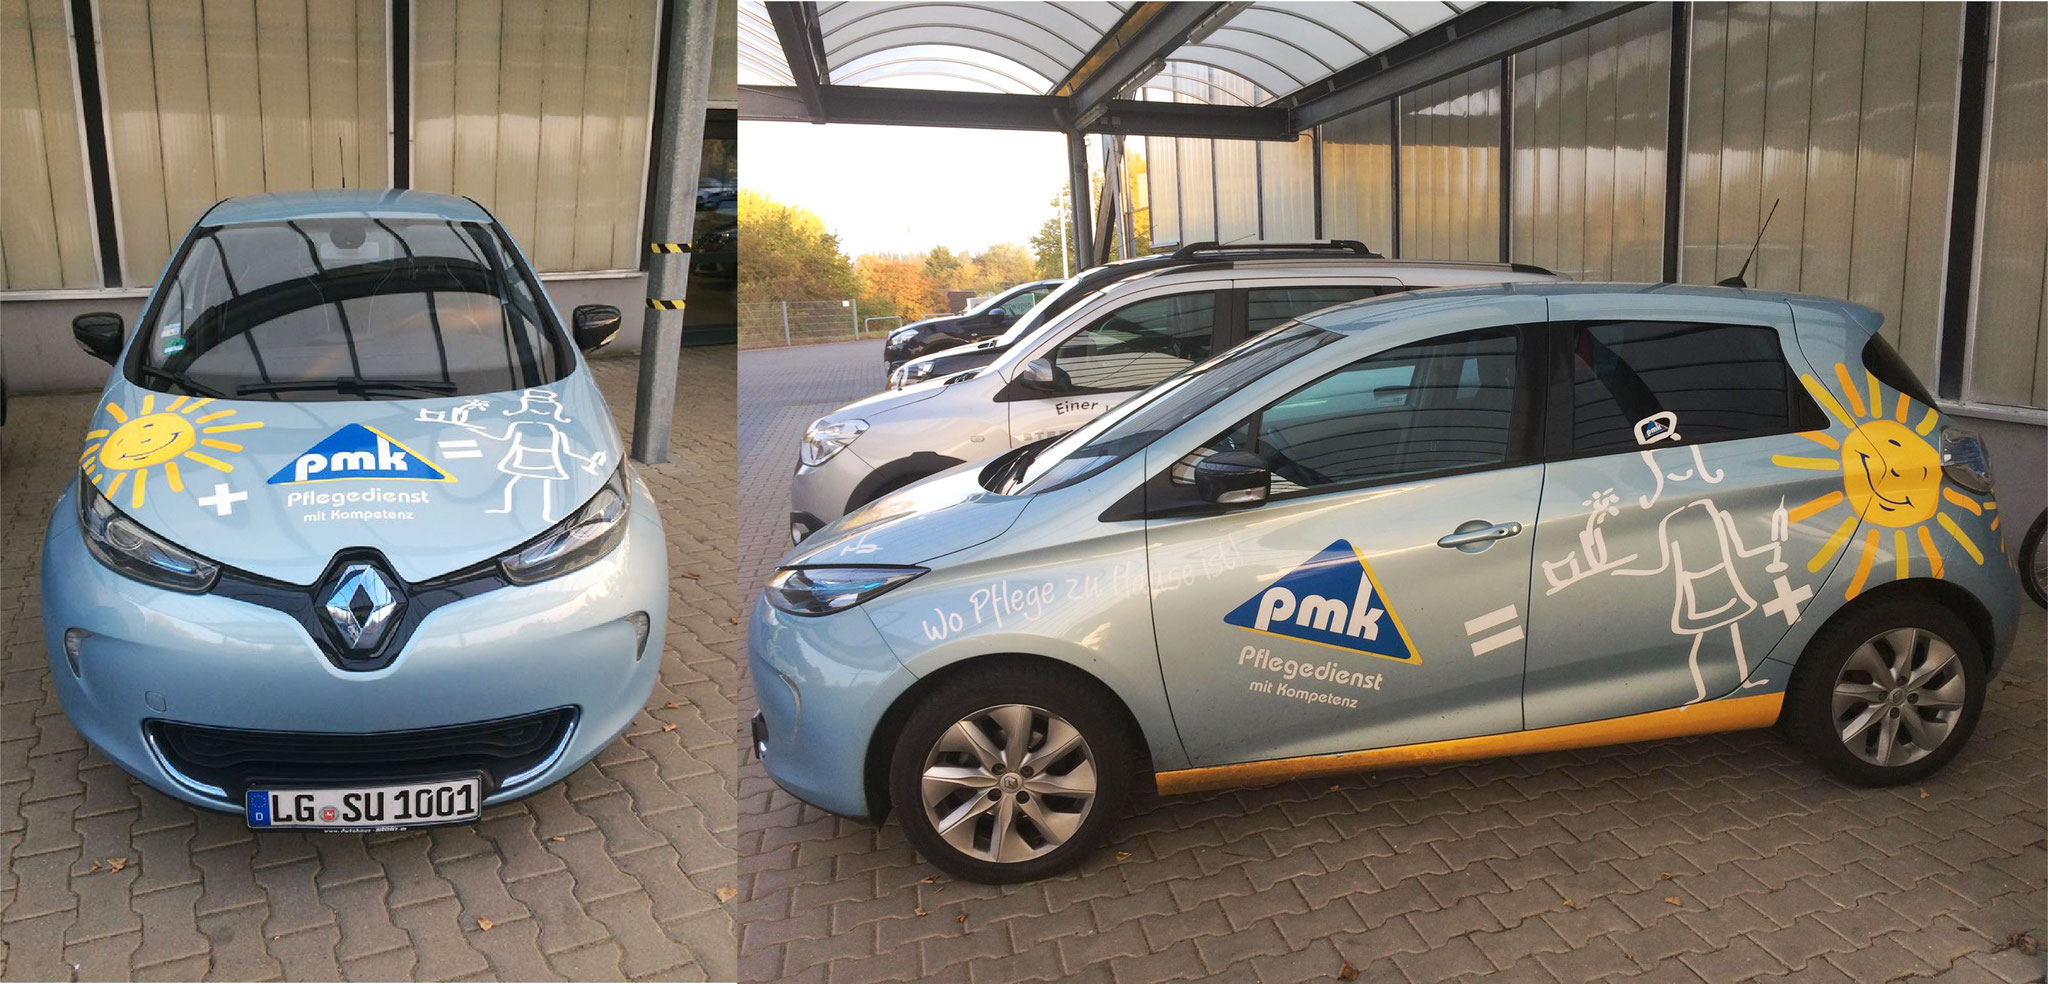 PMK-Pflegedienst GmbH Lüneburg - SUNNY 1